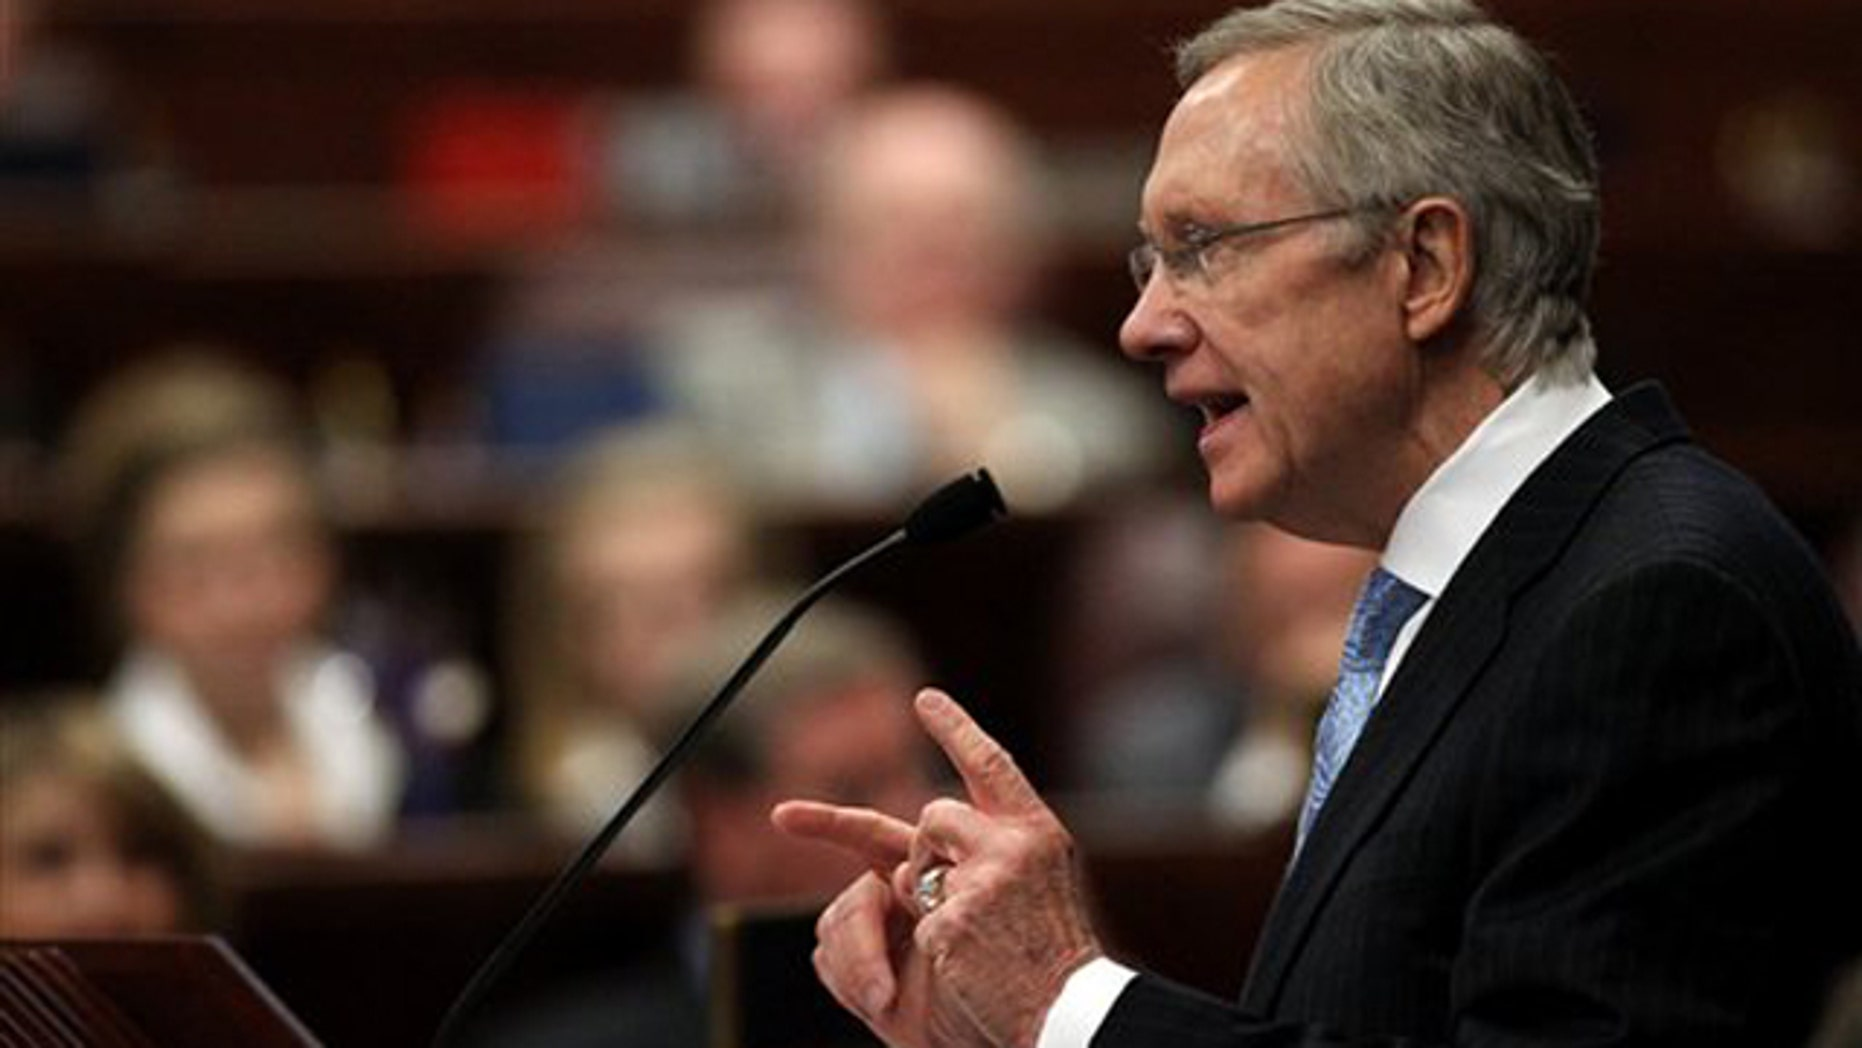 Senate Majority Leader Harry Reid speaks to a joint session of the Nevada Legislature on Feb. 22 in Carson City, Nev.